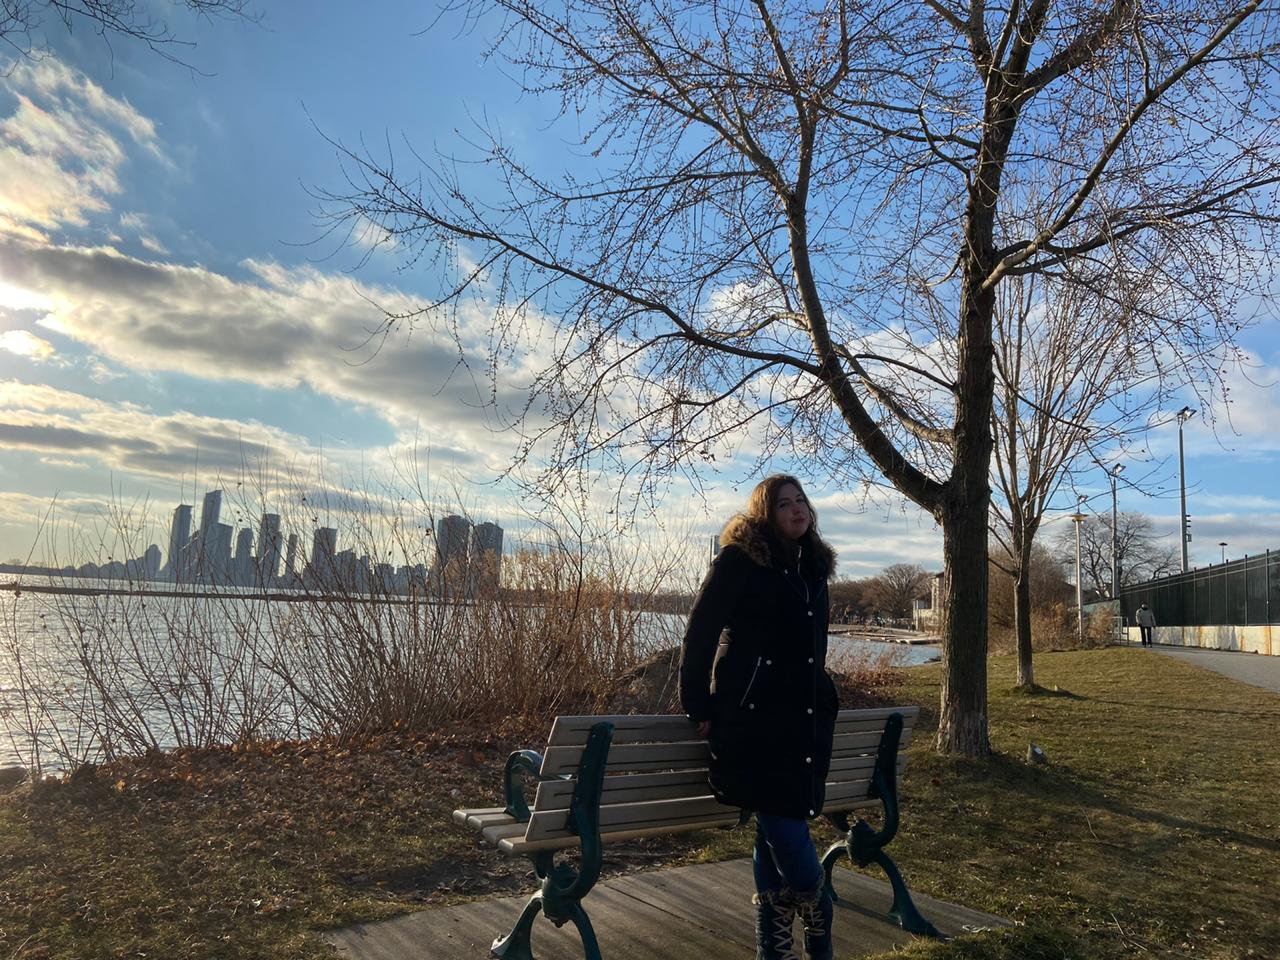 Júlia estudou no Canadá, na cidade de Toronto